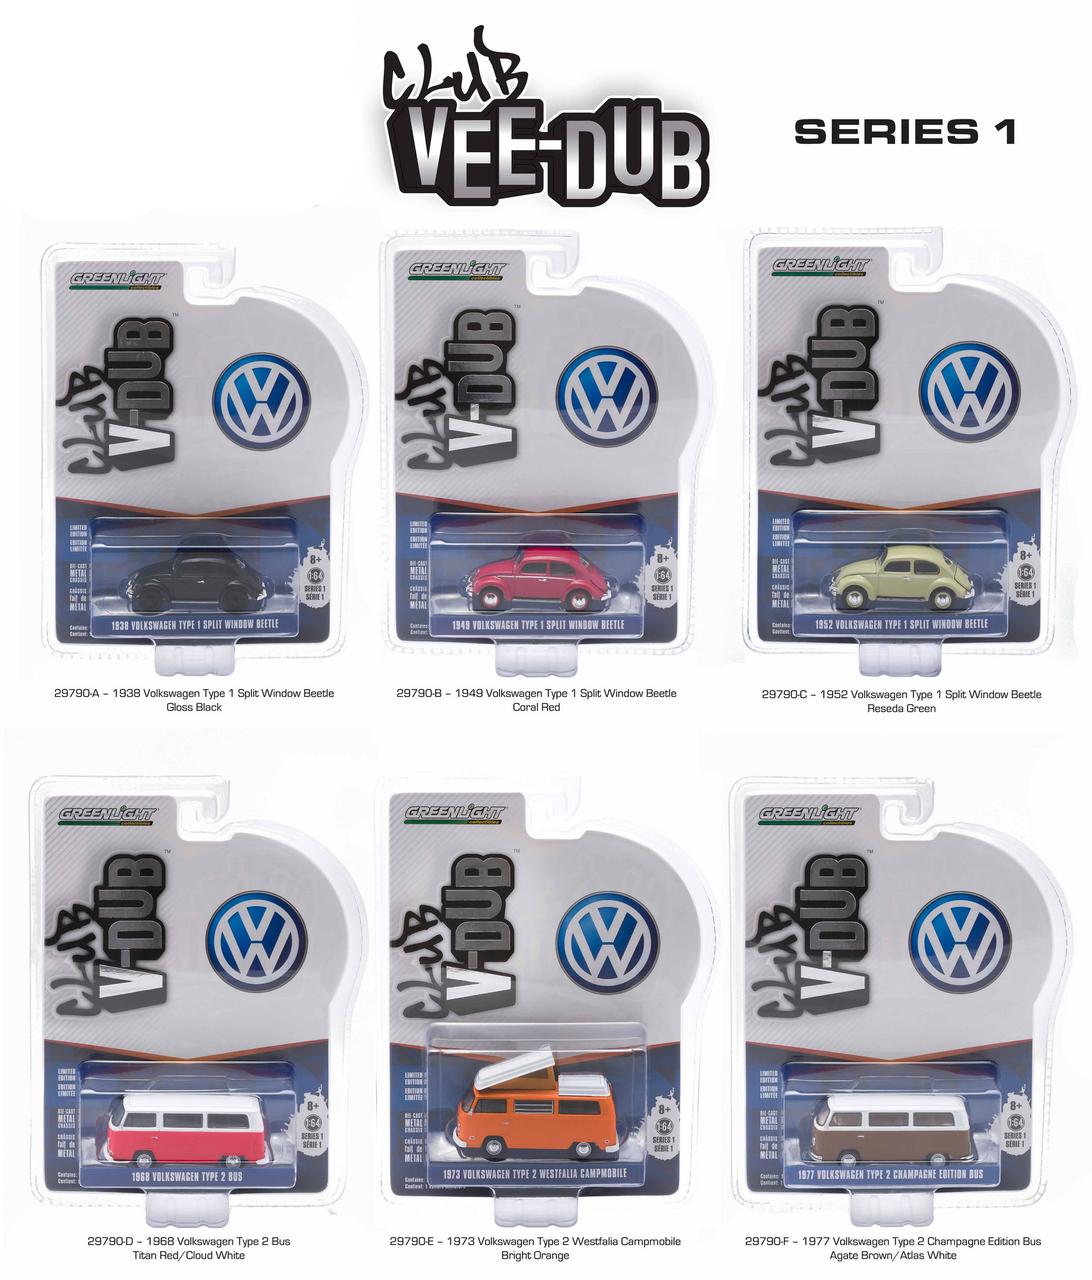 Greenlight Vee Dub Series 1 6pc Diecast Car Set 1/64 Diecast Model Car by Greenlight